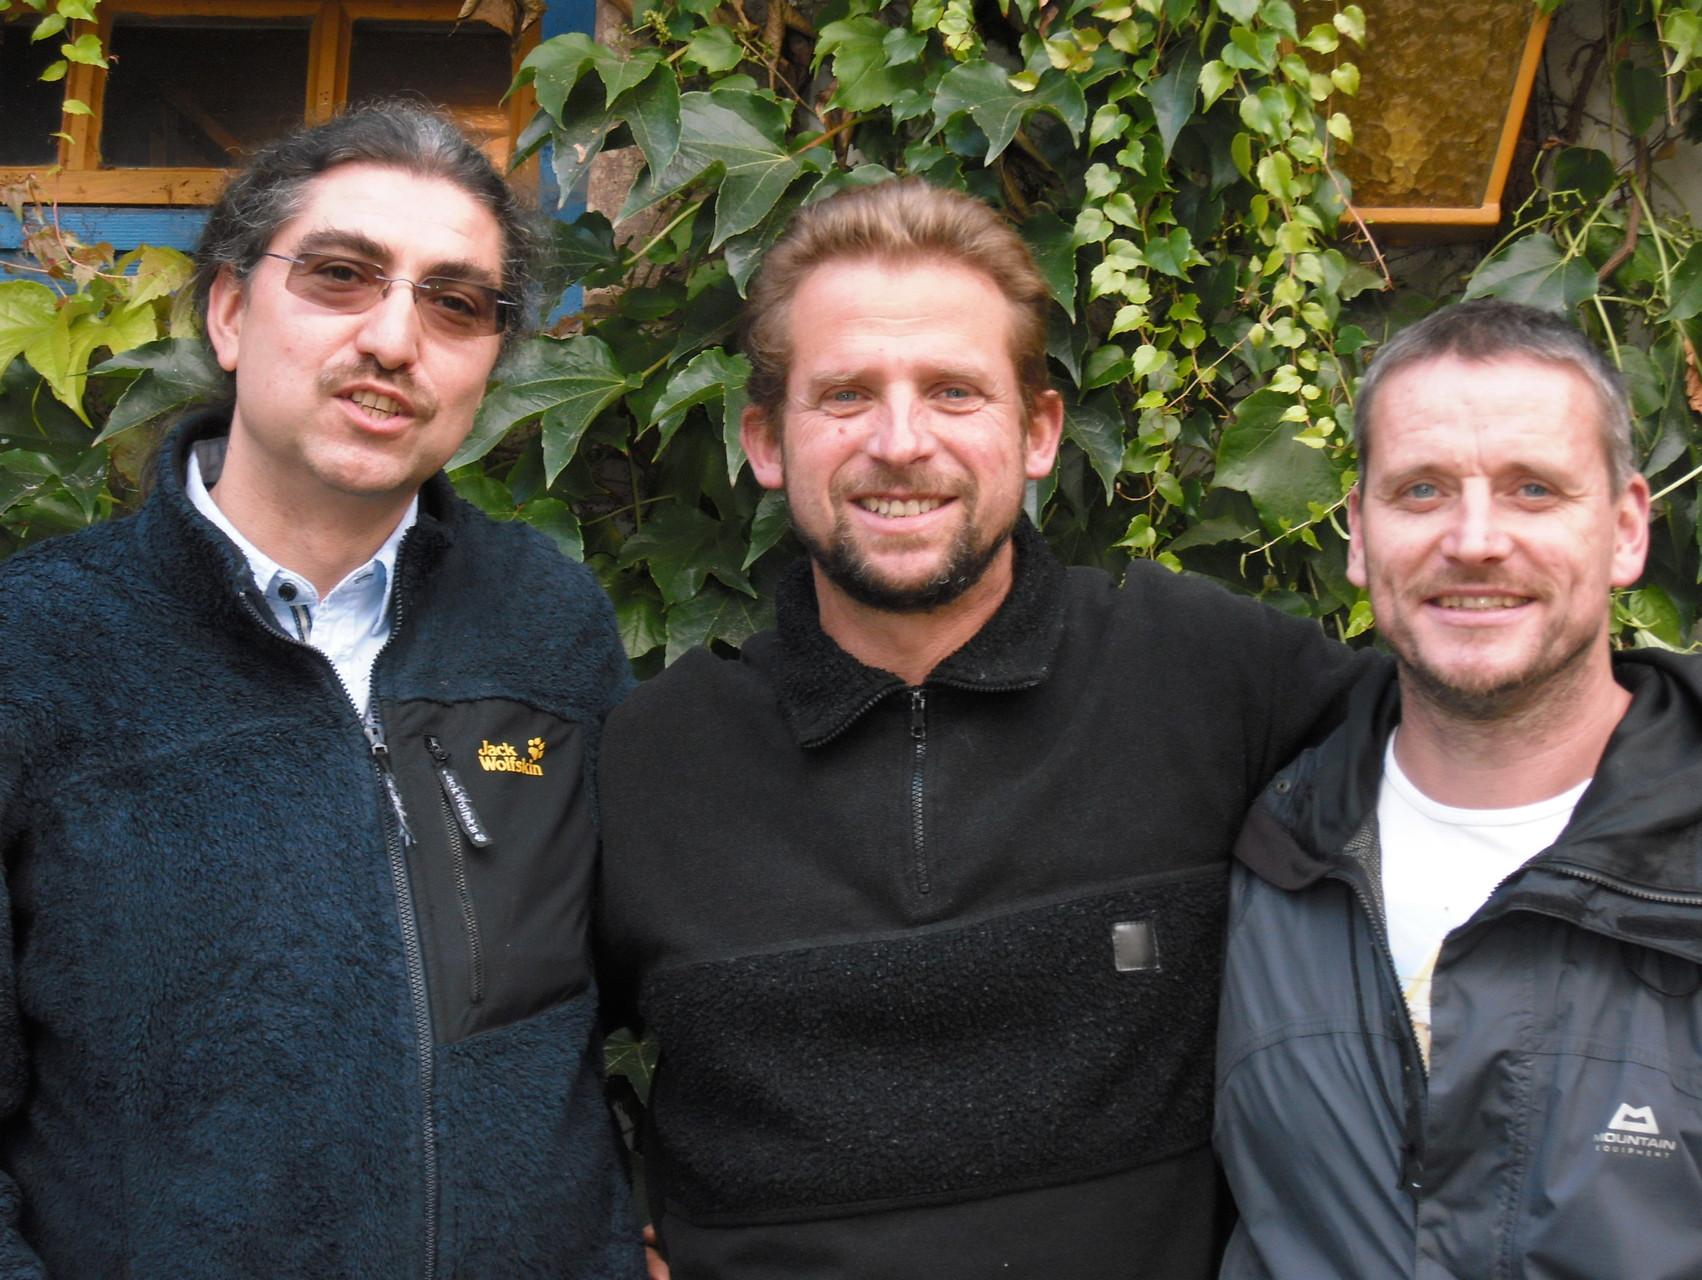 Unser Seminarteam - Jörg Schmidt, Steffen Thomas, Alexander Schmalfuß